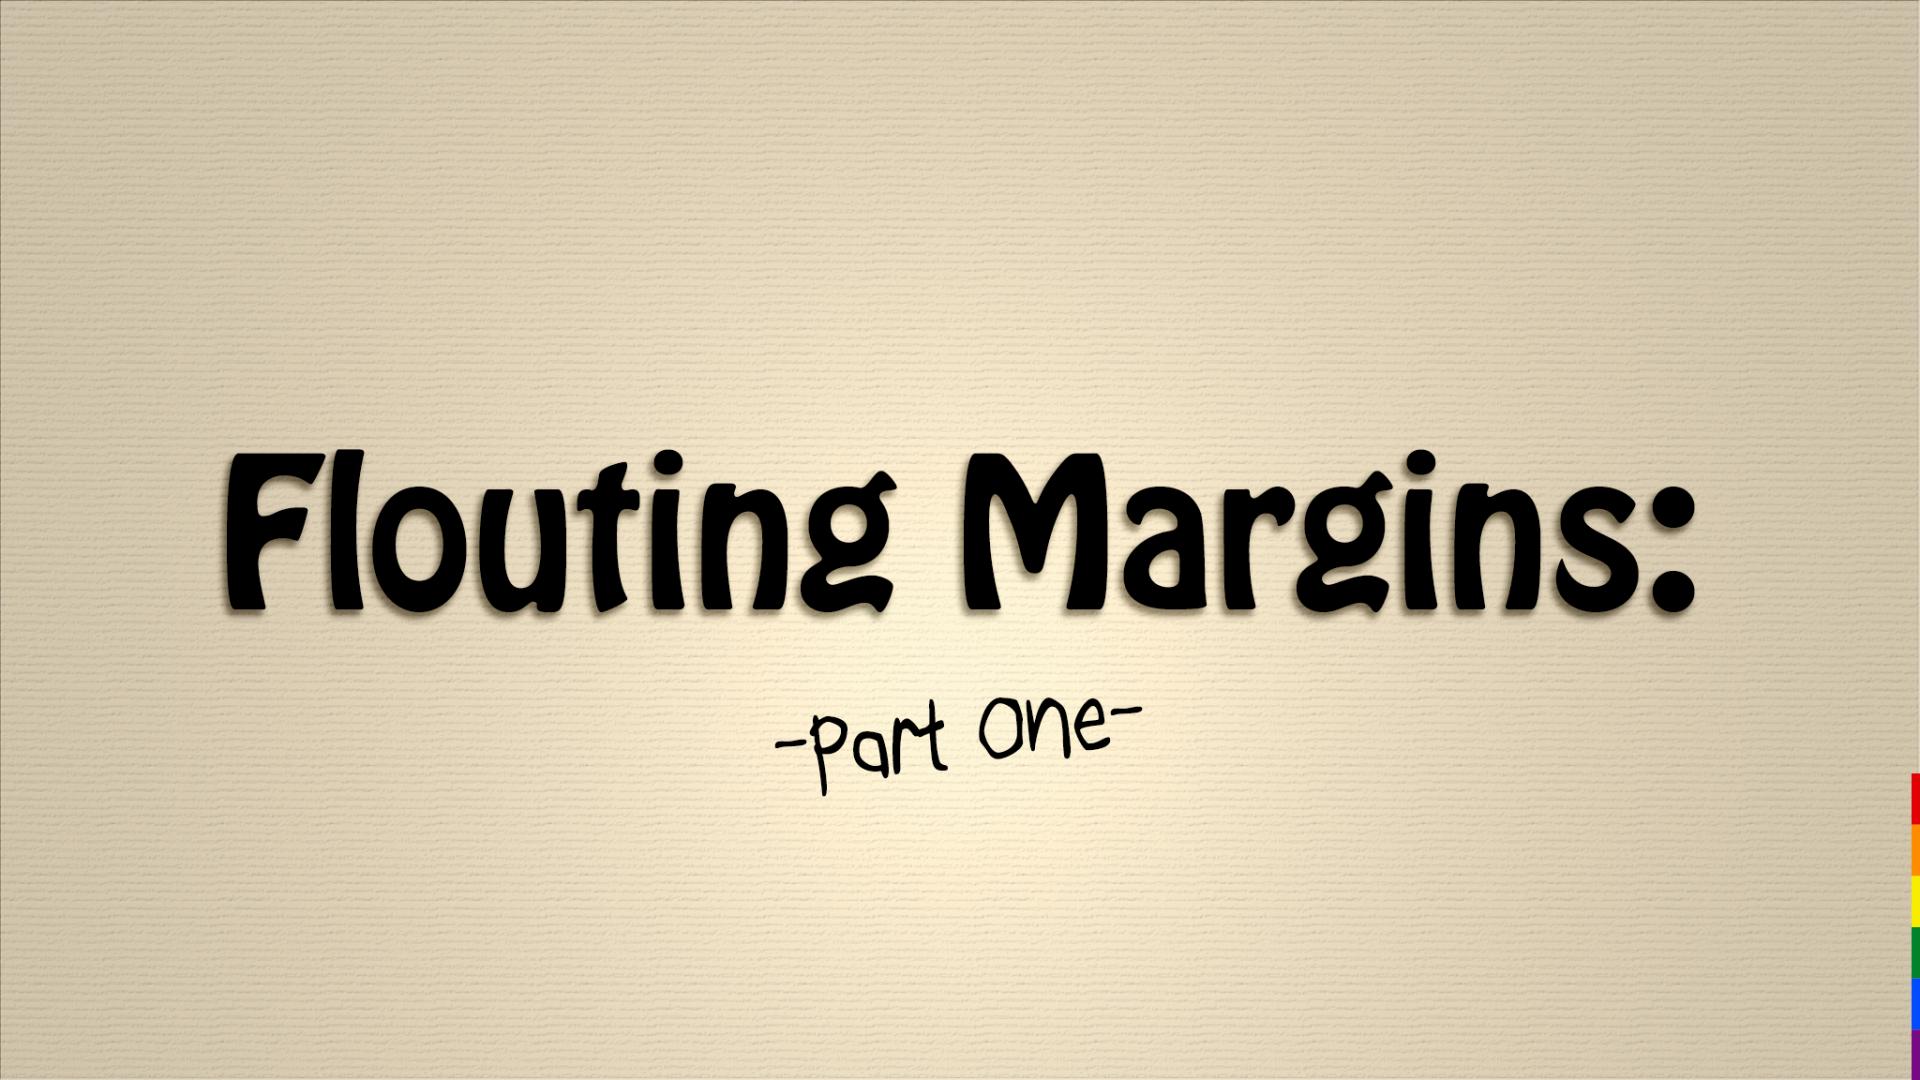 LGBT Flouting Margins